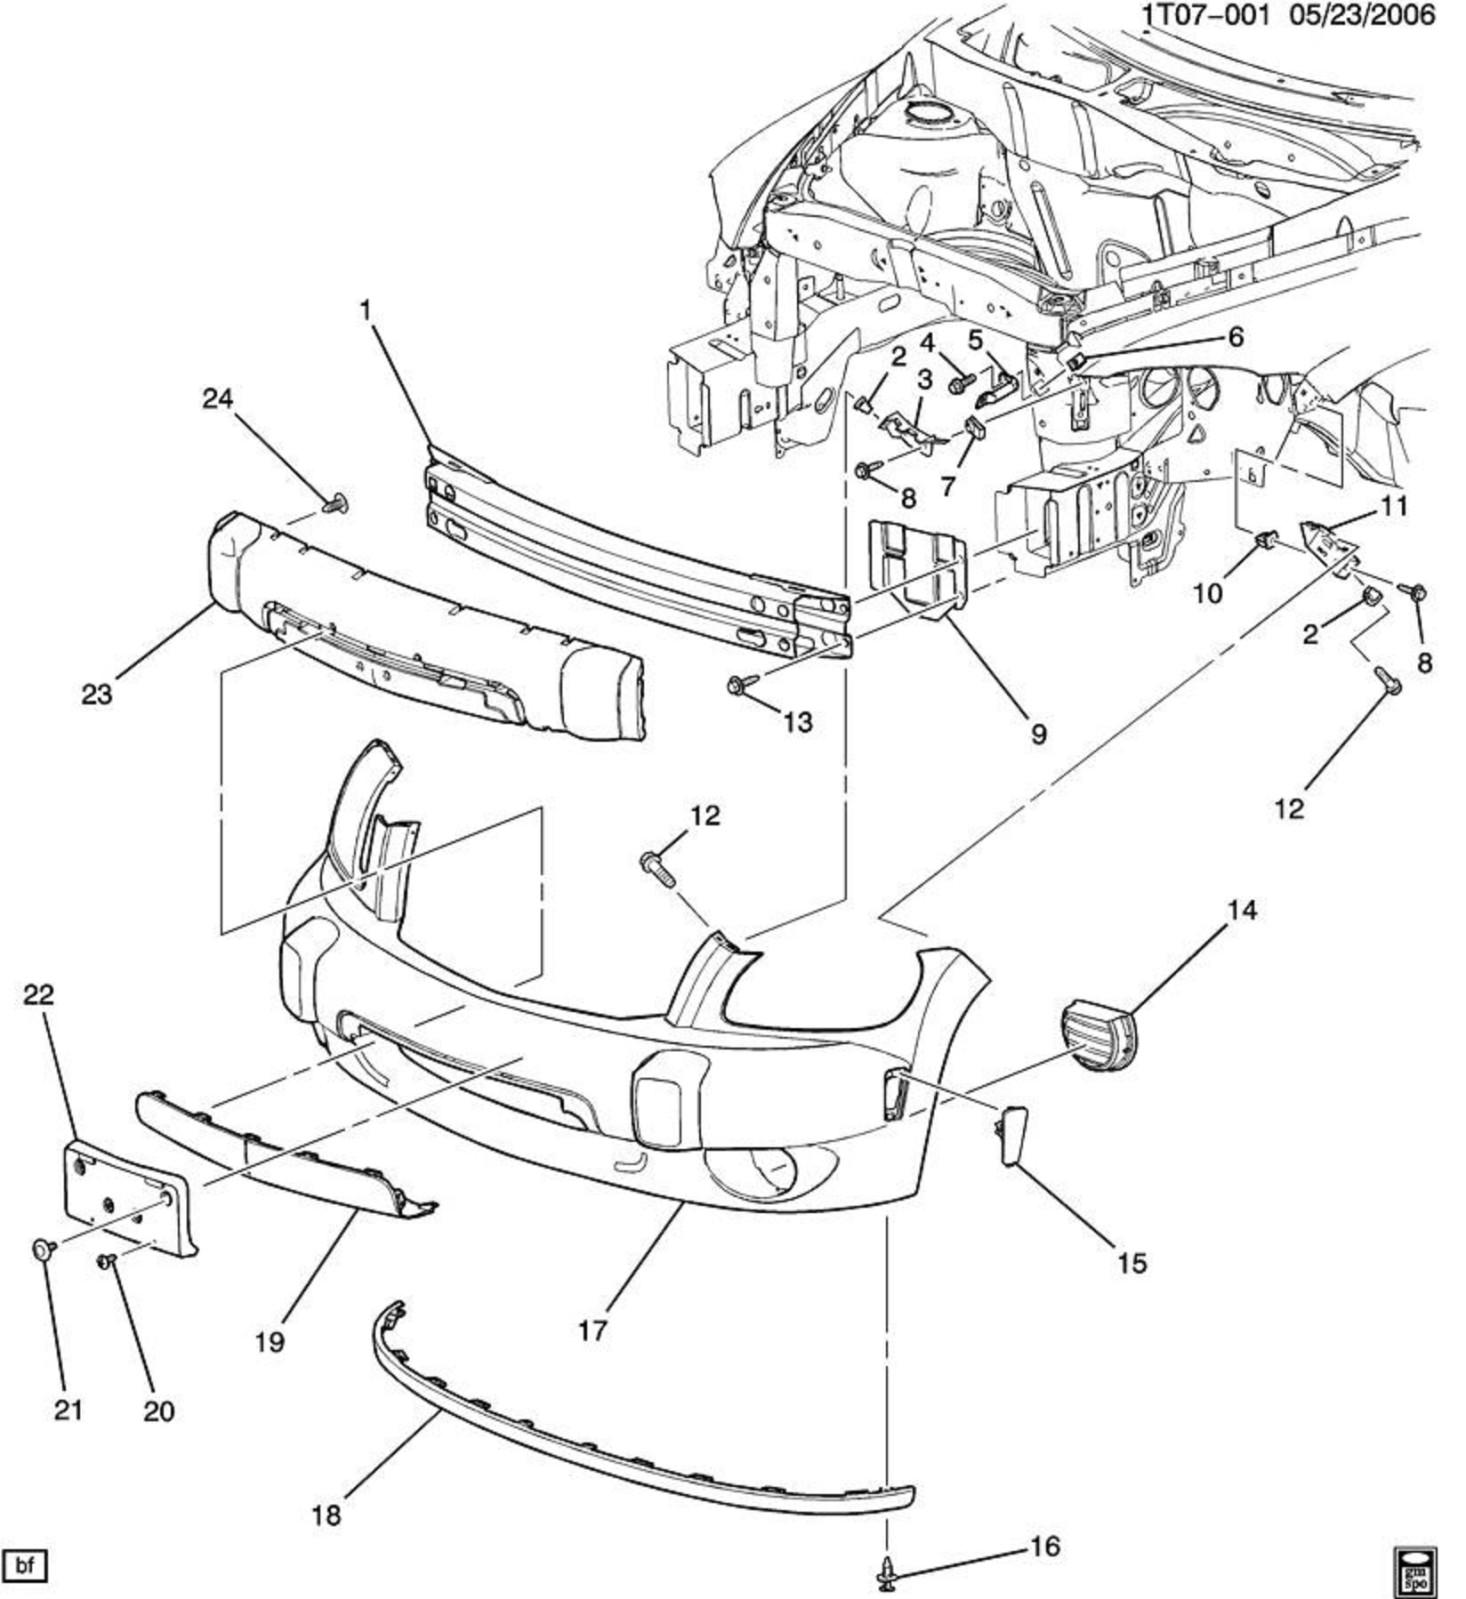 Front End Suspension Parts Diagram Front Clip assembly Chevy Hhr Network Of Front End Suspension Parts Diagram